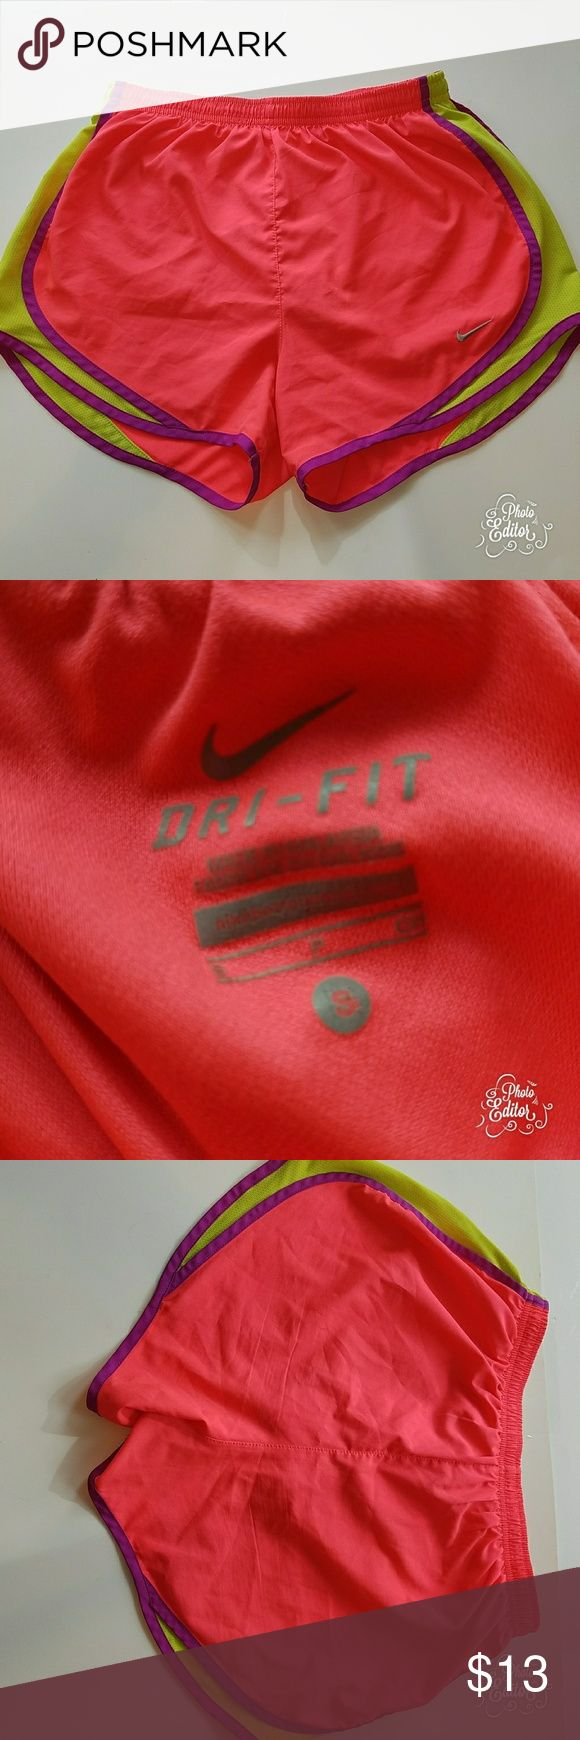 Nike dri-fit shorts size small Nike dri fit shorts size small. Bright orange, purple, & yellow. Nike Shorts